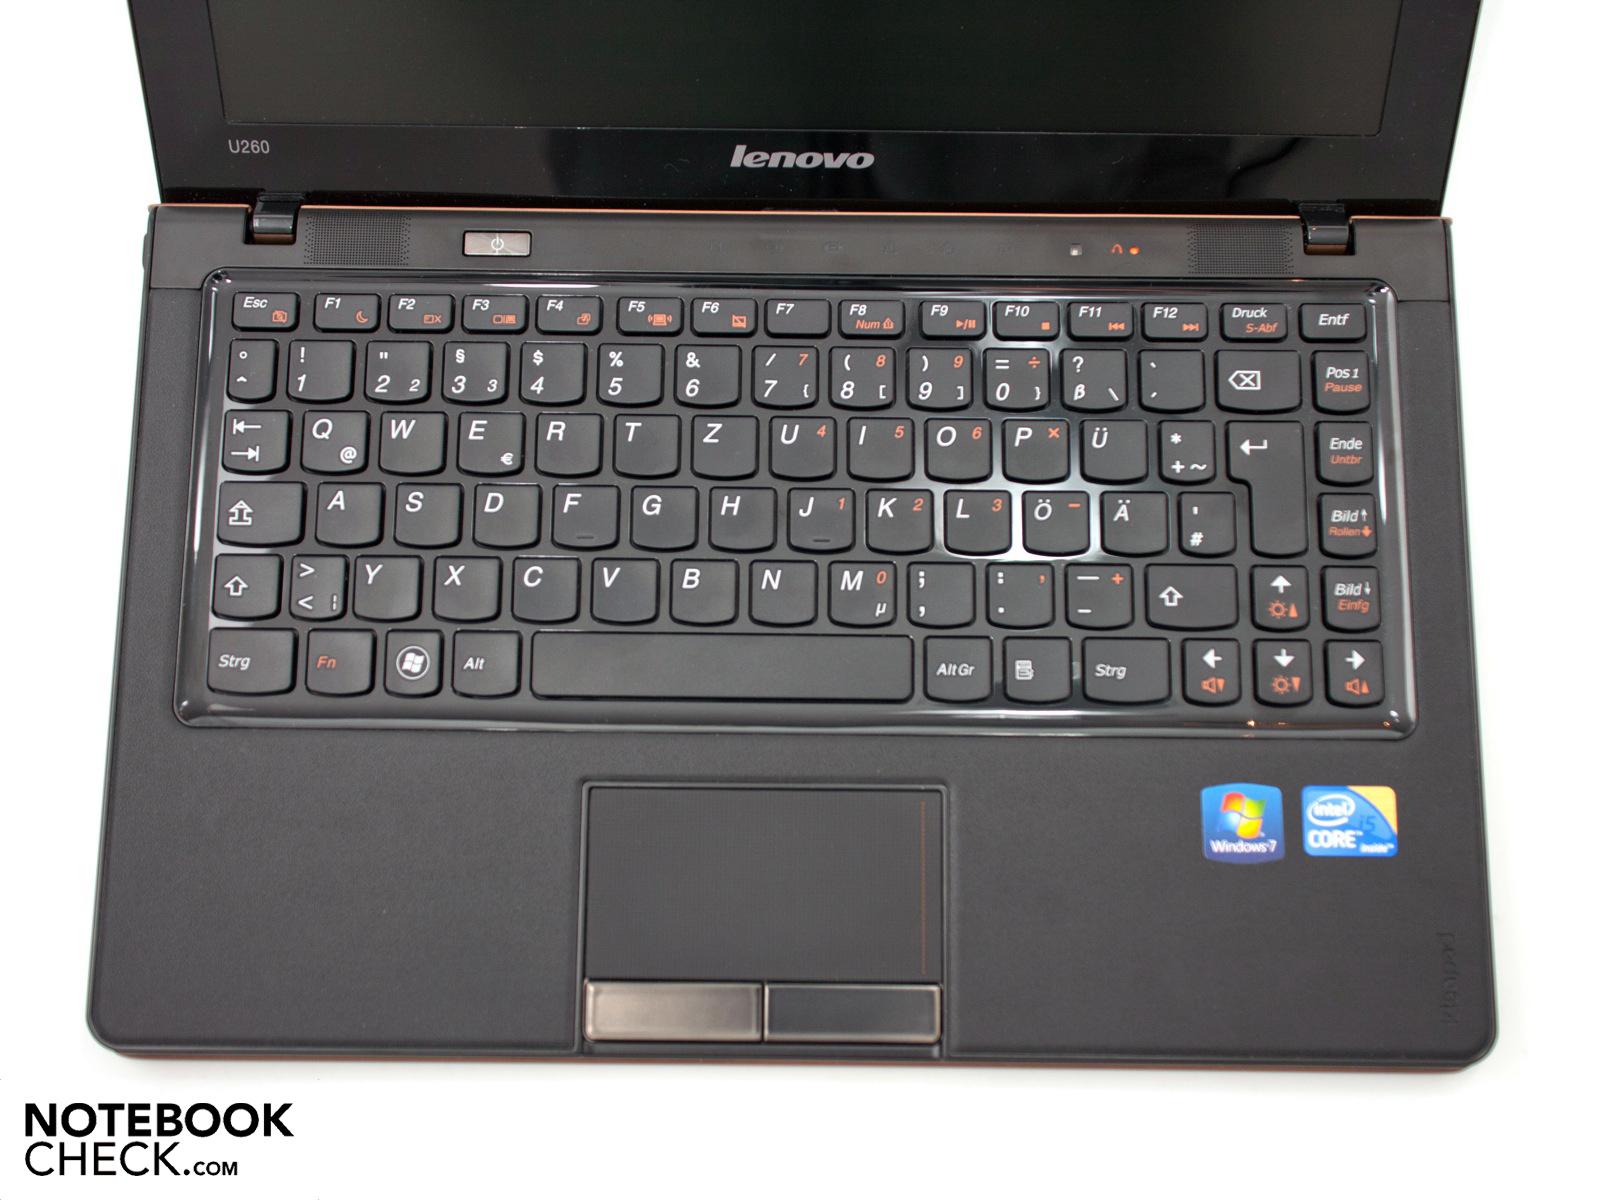 MSI CX620MX NOTEBOOK CAMERA/VGA/EC TREIBER